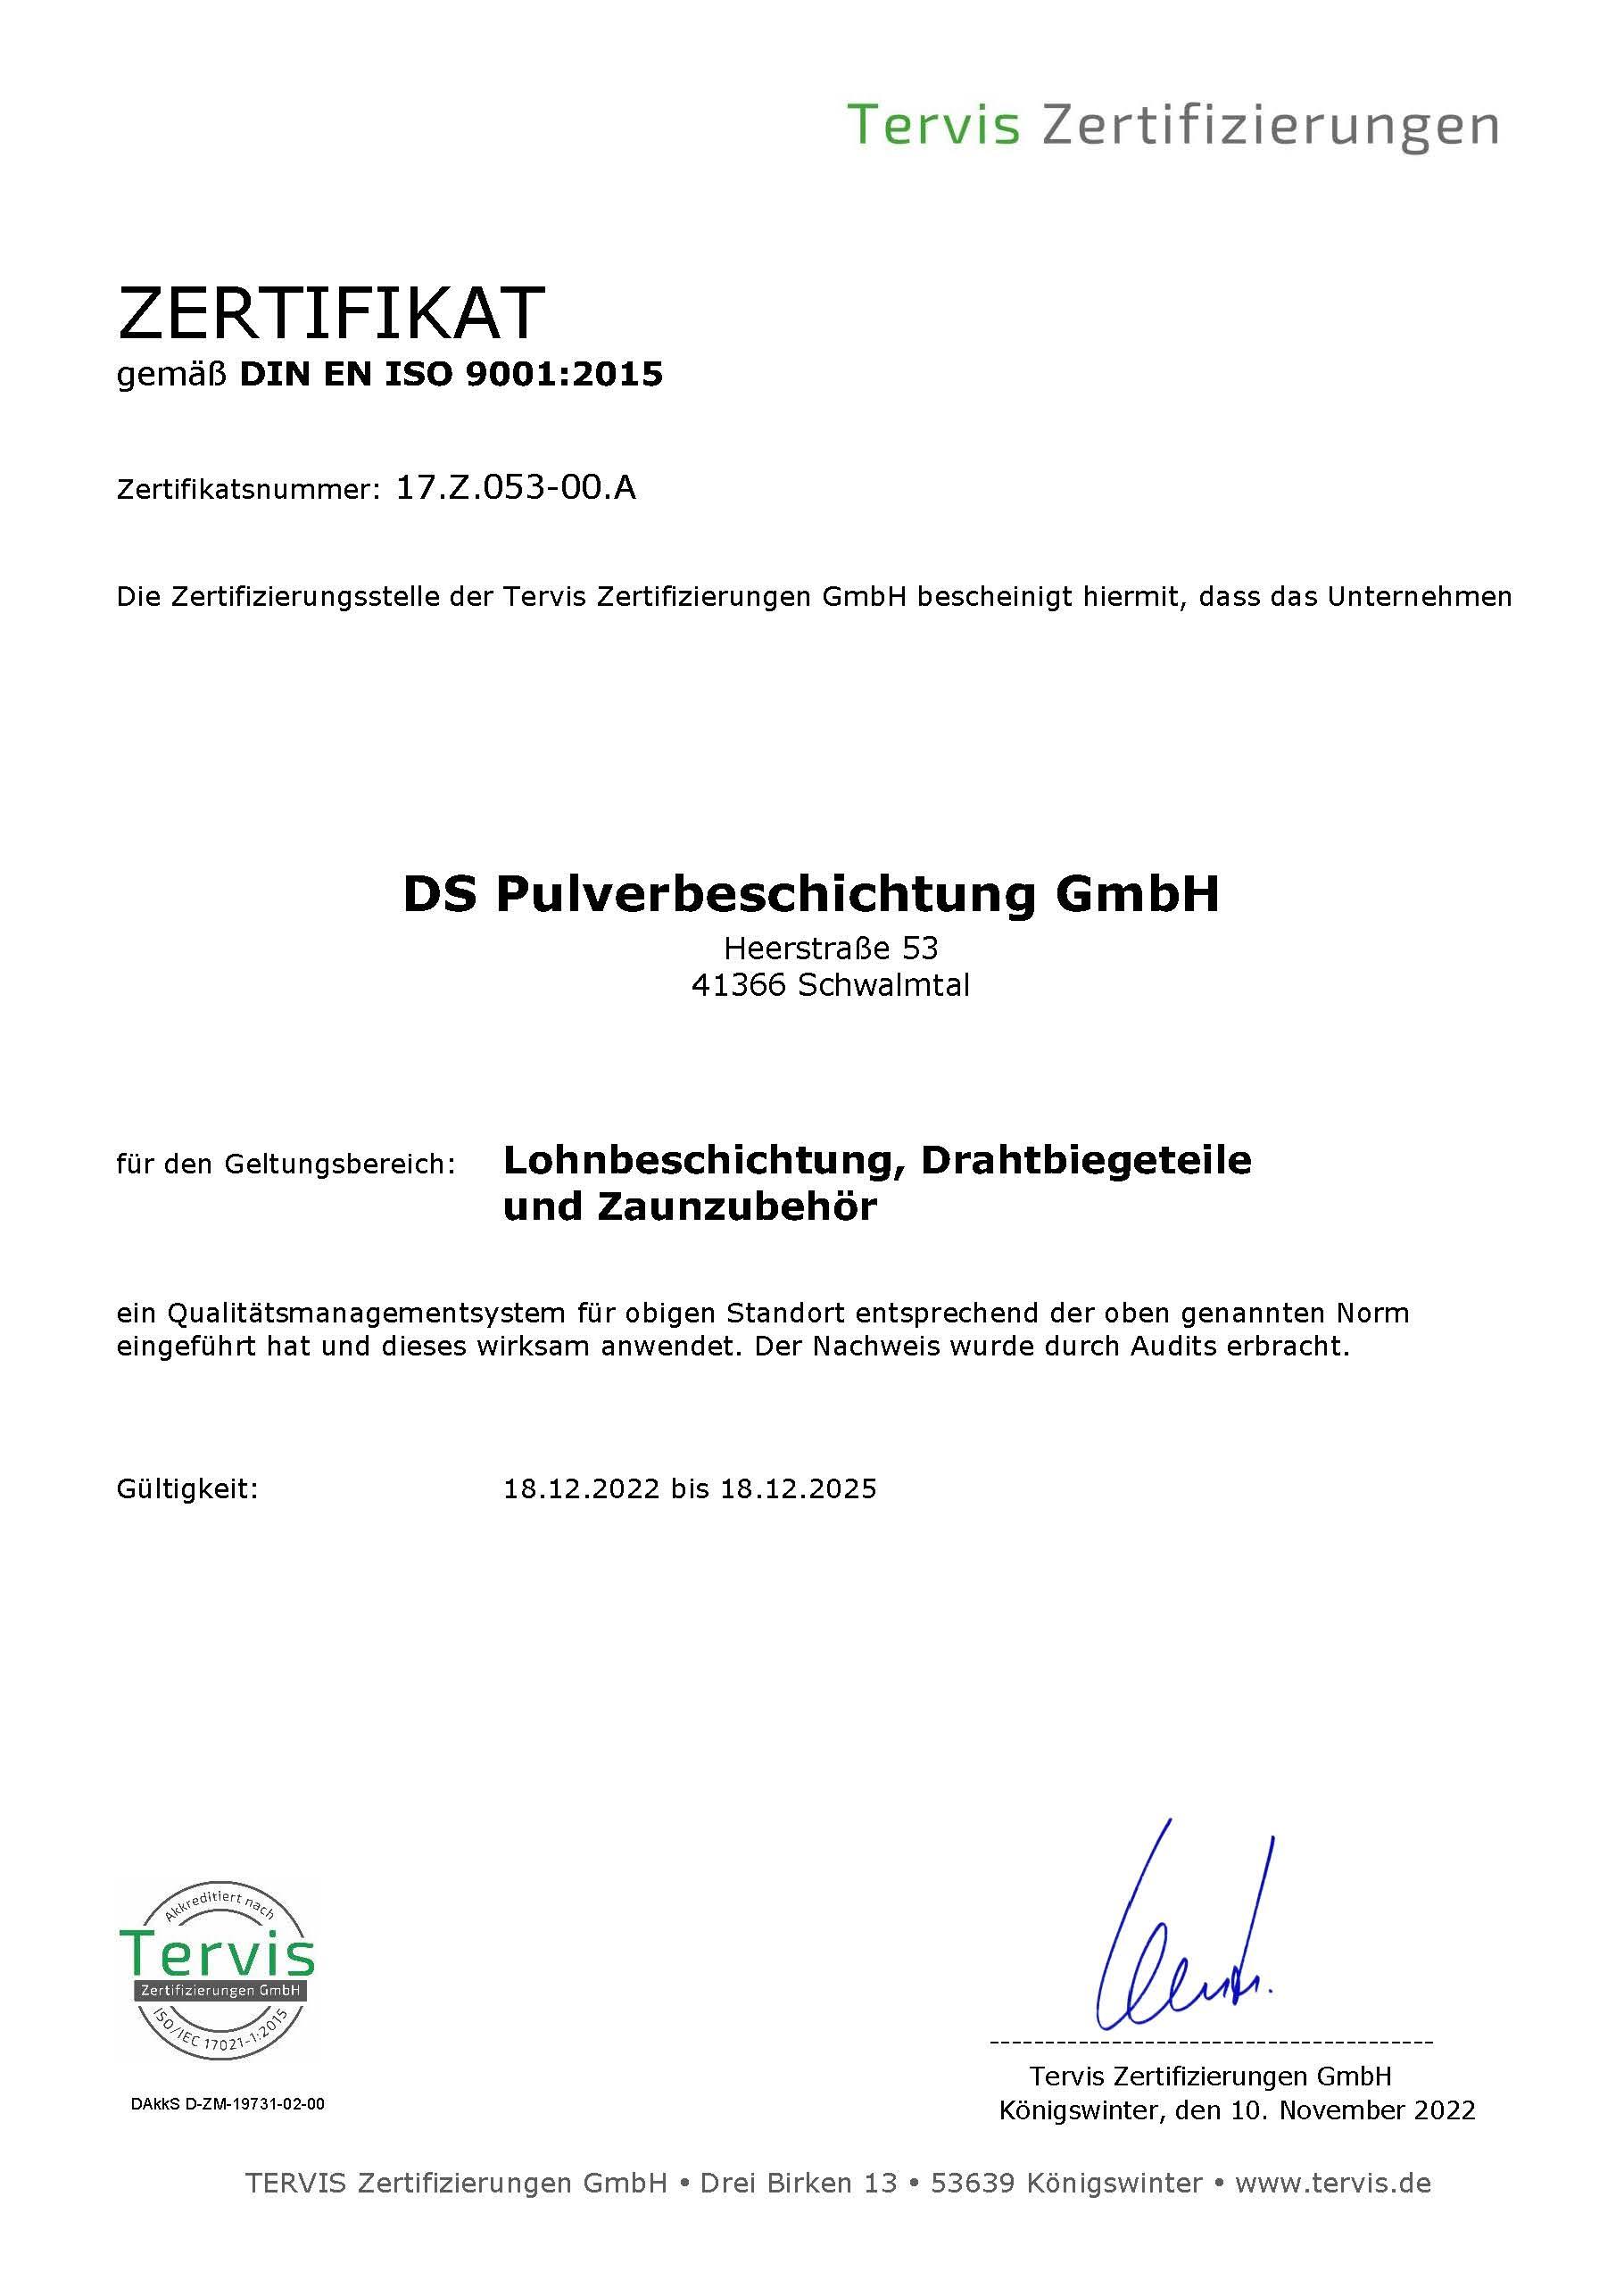 Zertifikat gemäß DIN EN ISO 9001:2015 Qualitätsmanagementsystem DS Pulverbeschichtung GmbH